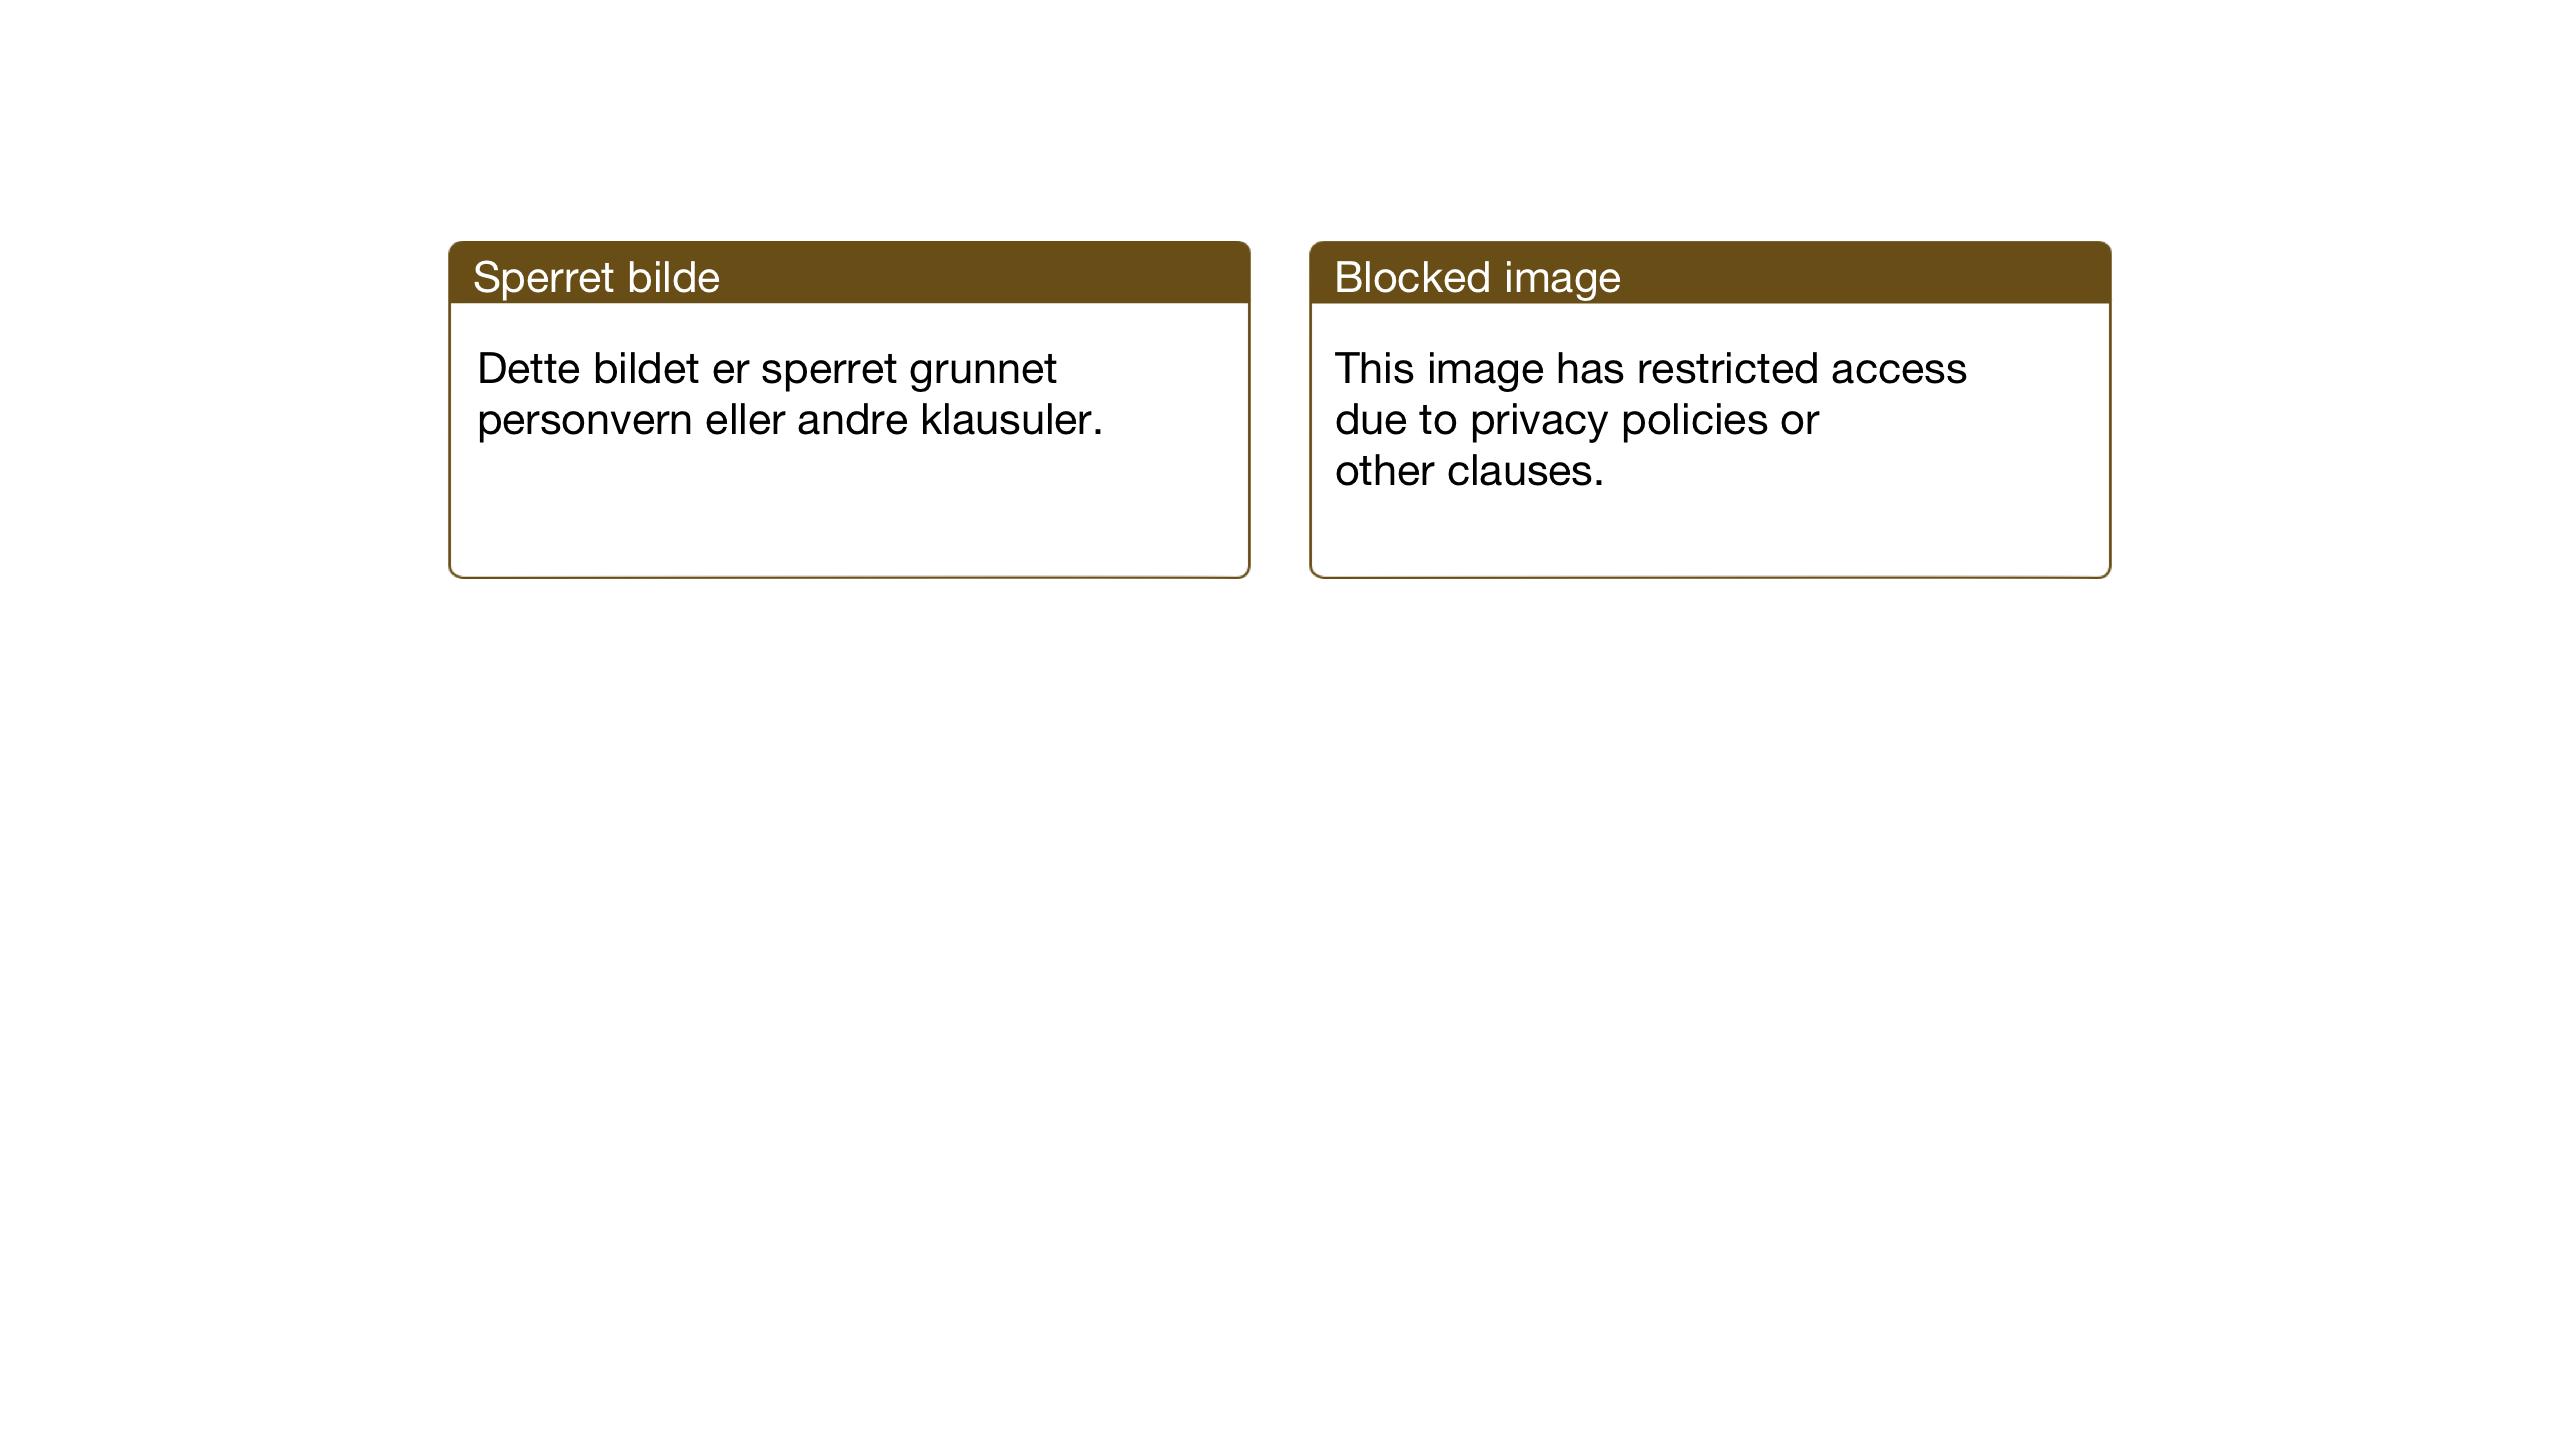 SAT, Ministerialprotokoller, klokkerbøker og fødselsregistre - Nordland, 847/L0680: Klokkerbok nr. 847C08, 1930-1947, s. 297